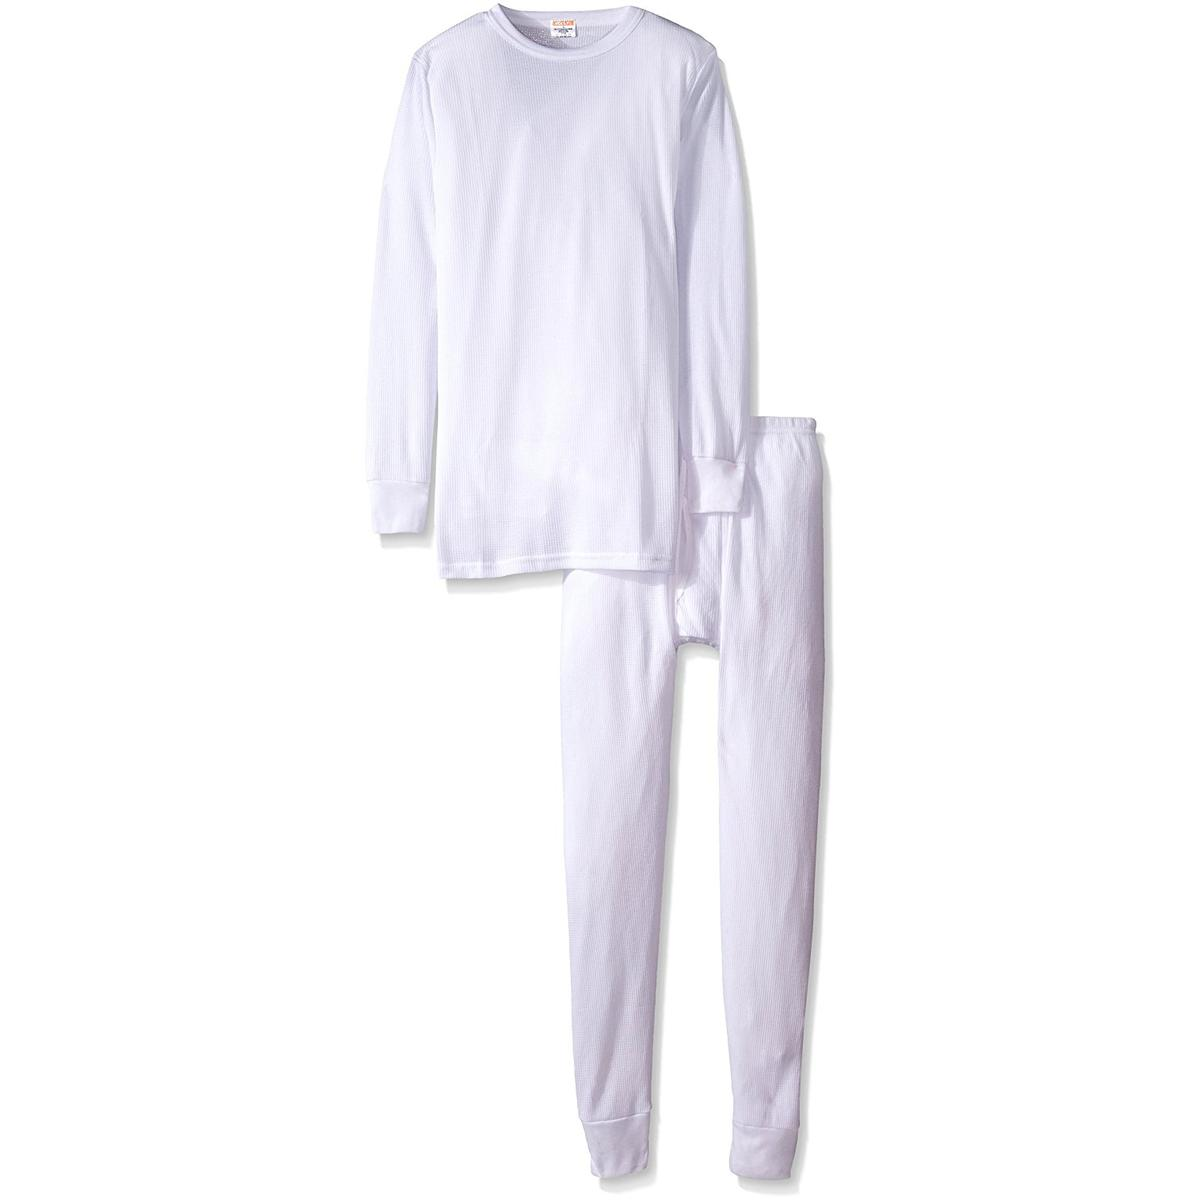 Rocky Mens 2PC Long John Thermal Underwear